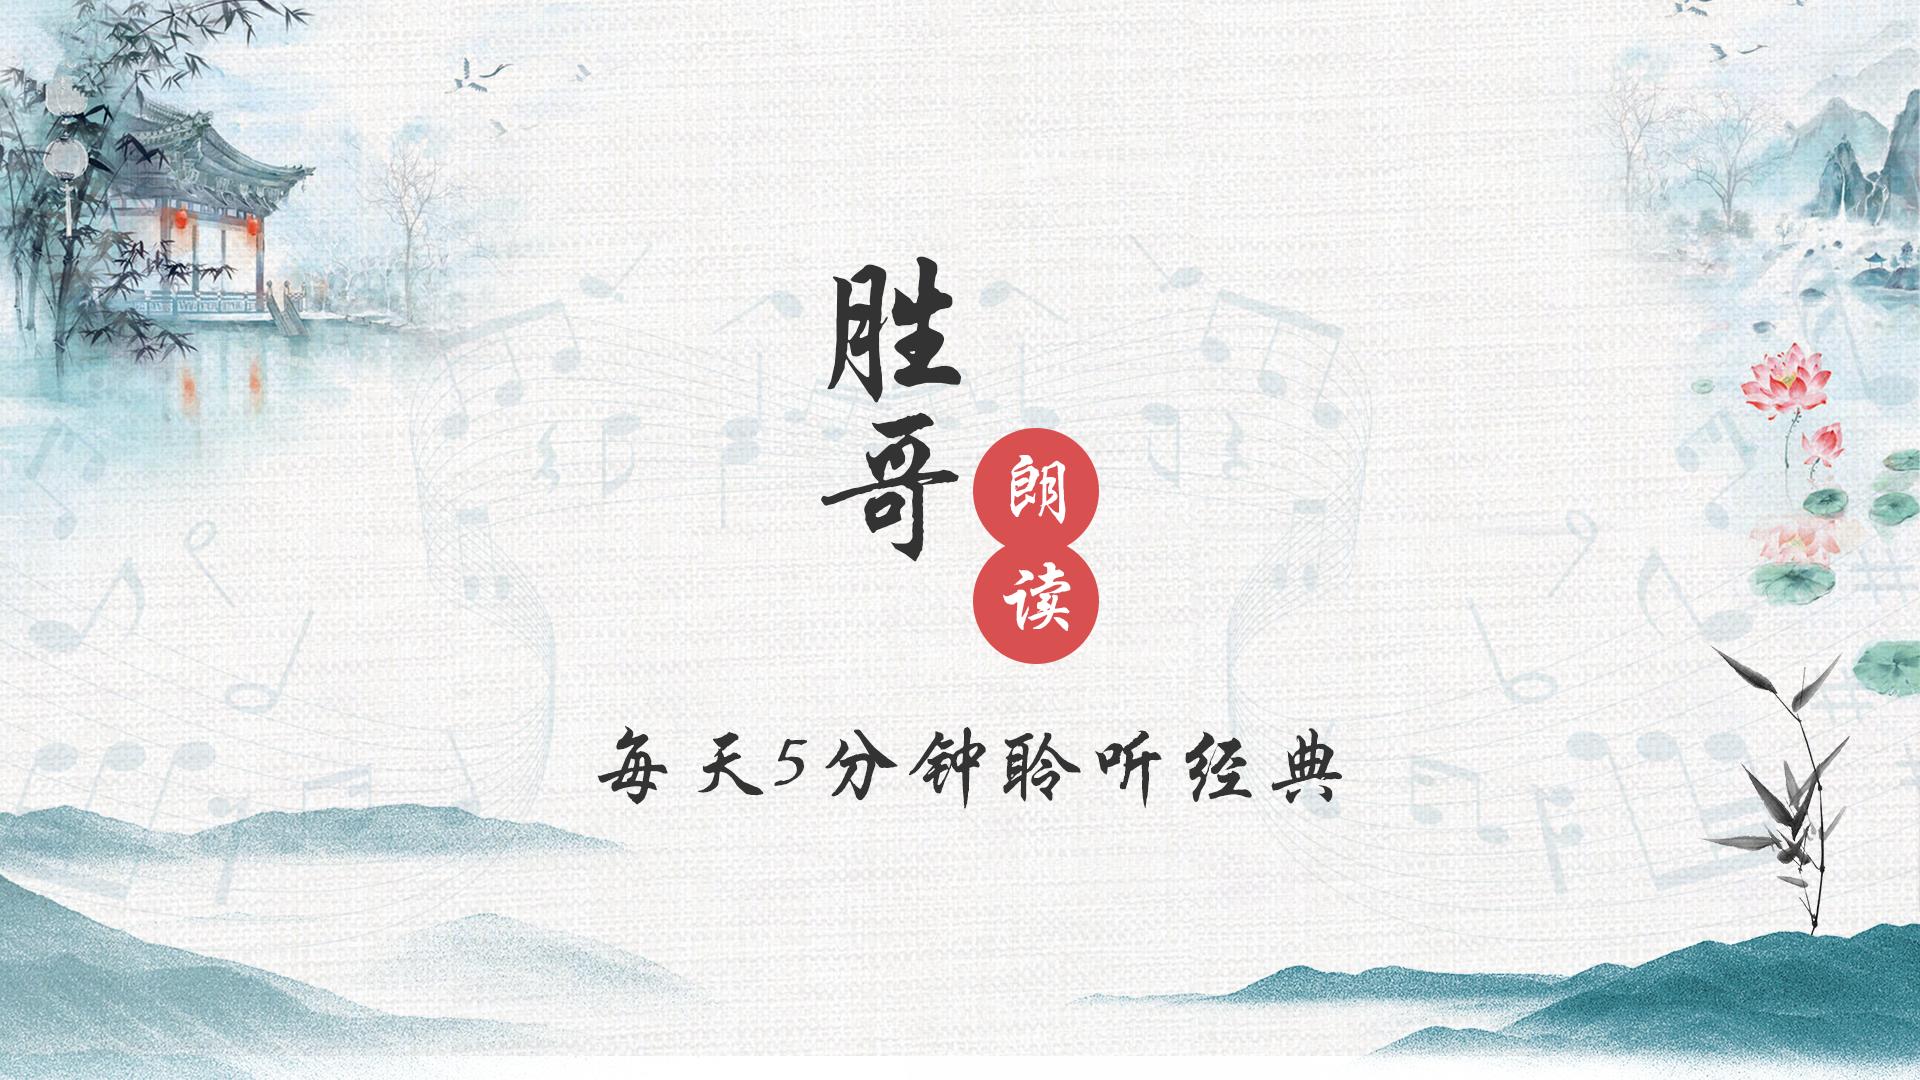 勝哥(ge)朗讀(du)封(feng)面圖.png